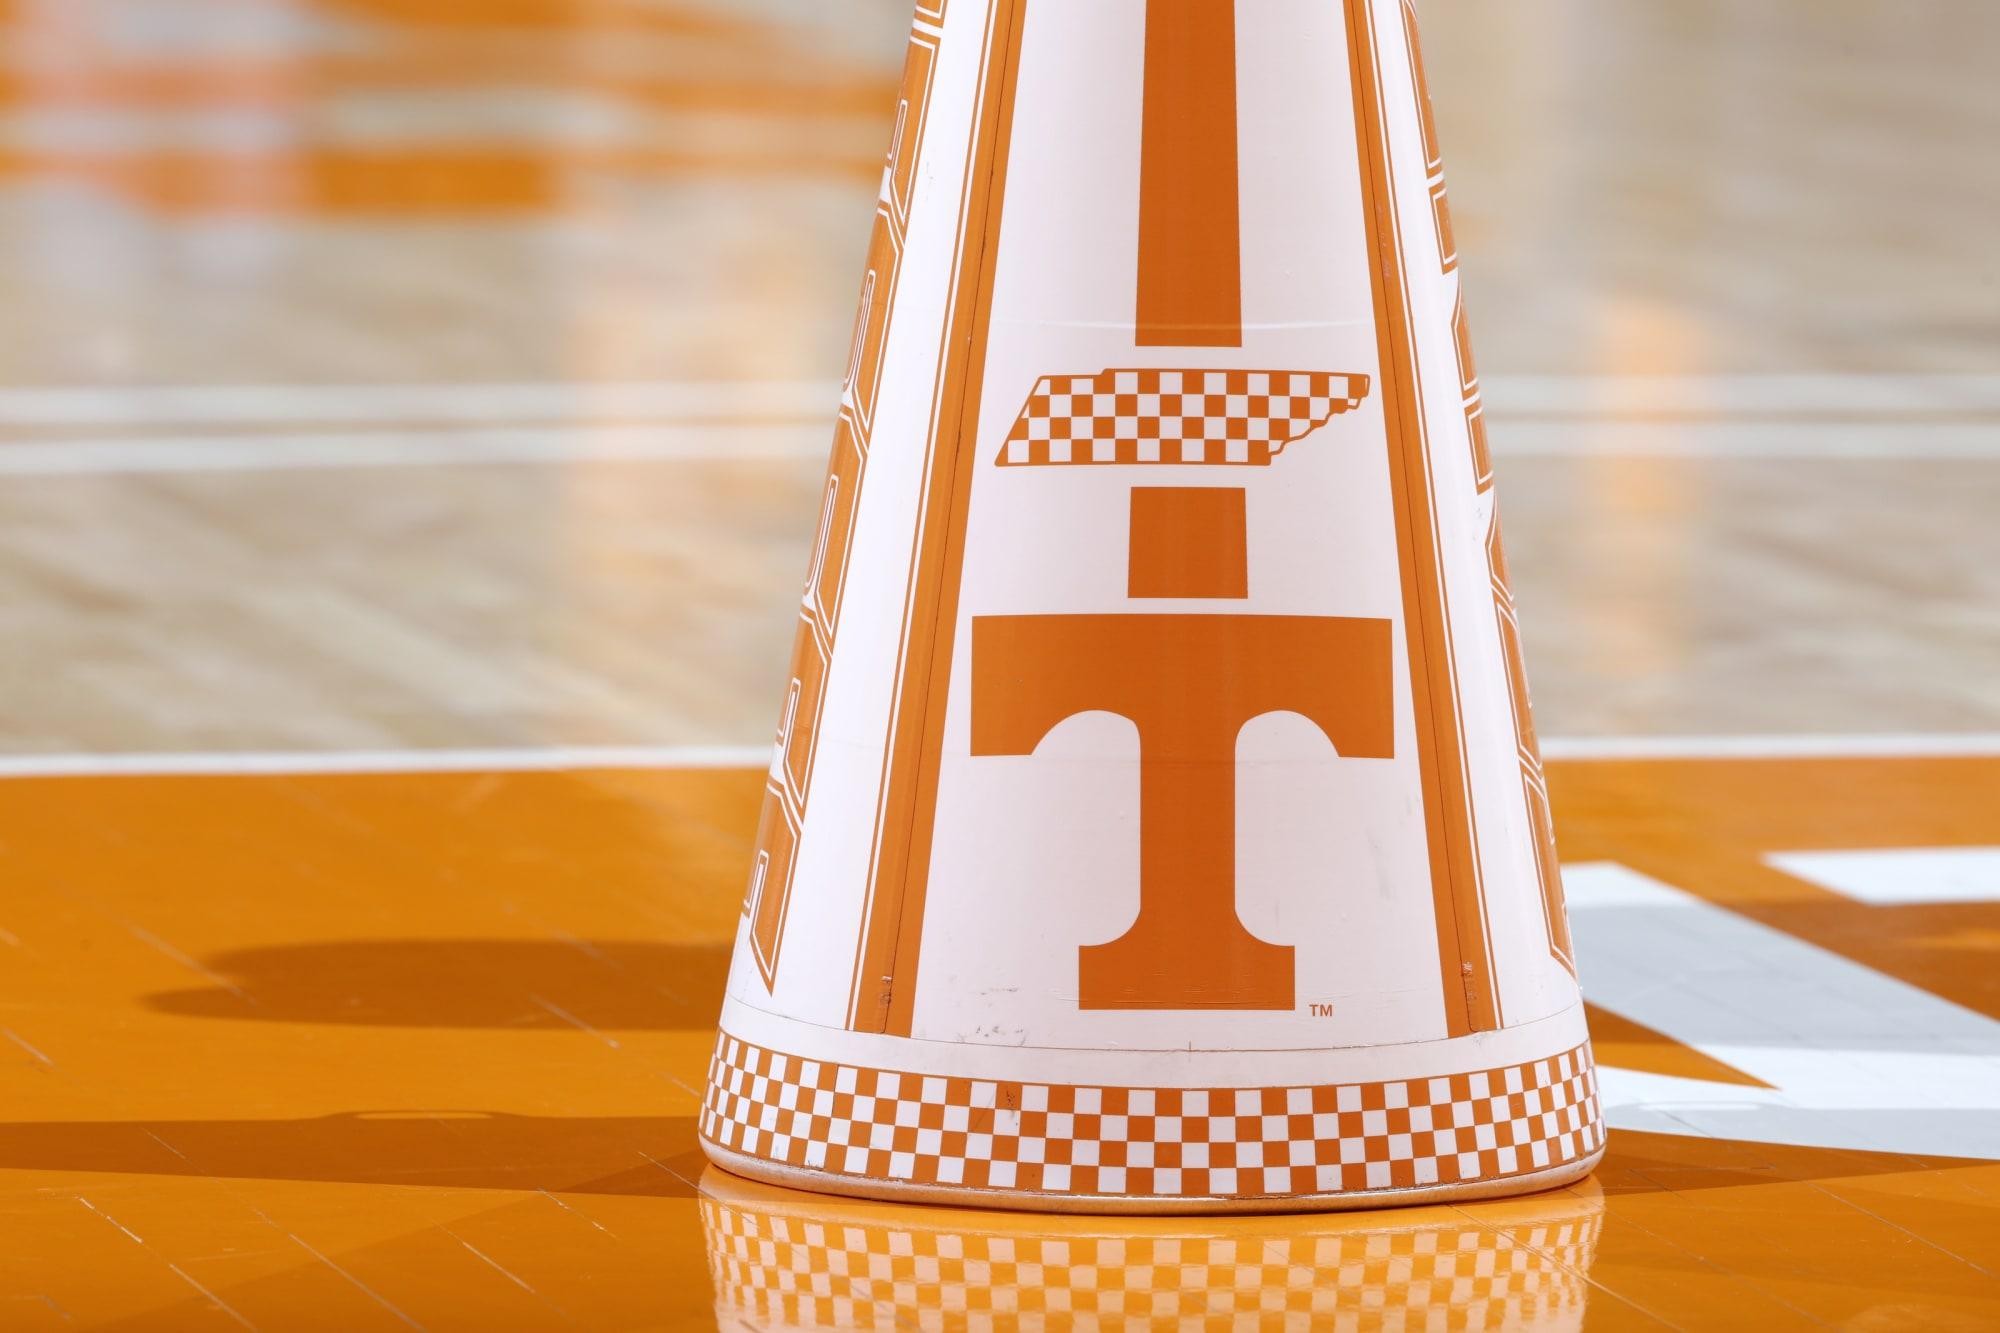 Tennessee basketball vs. No. 19 Missouri: Live stream, game time, TV, radio